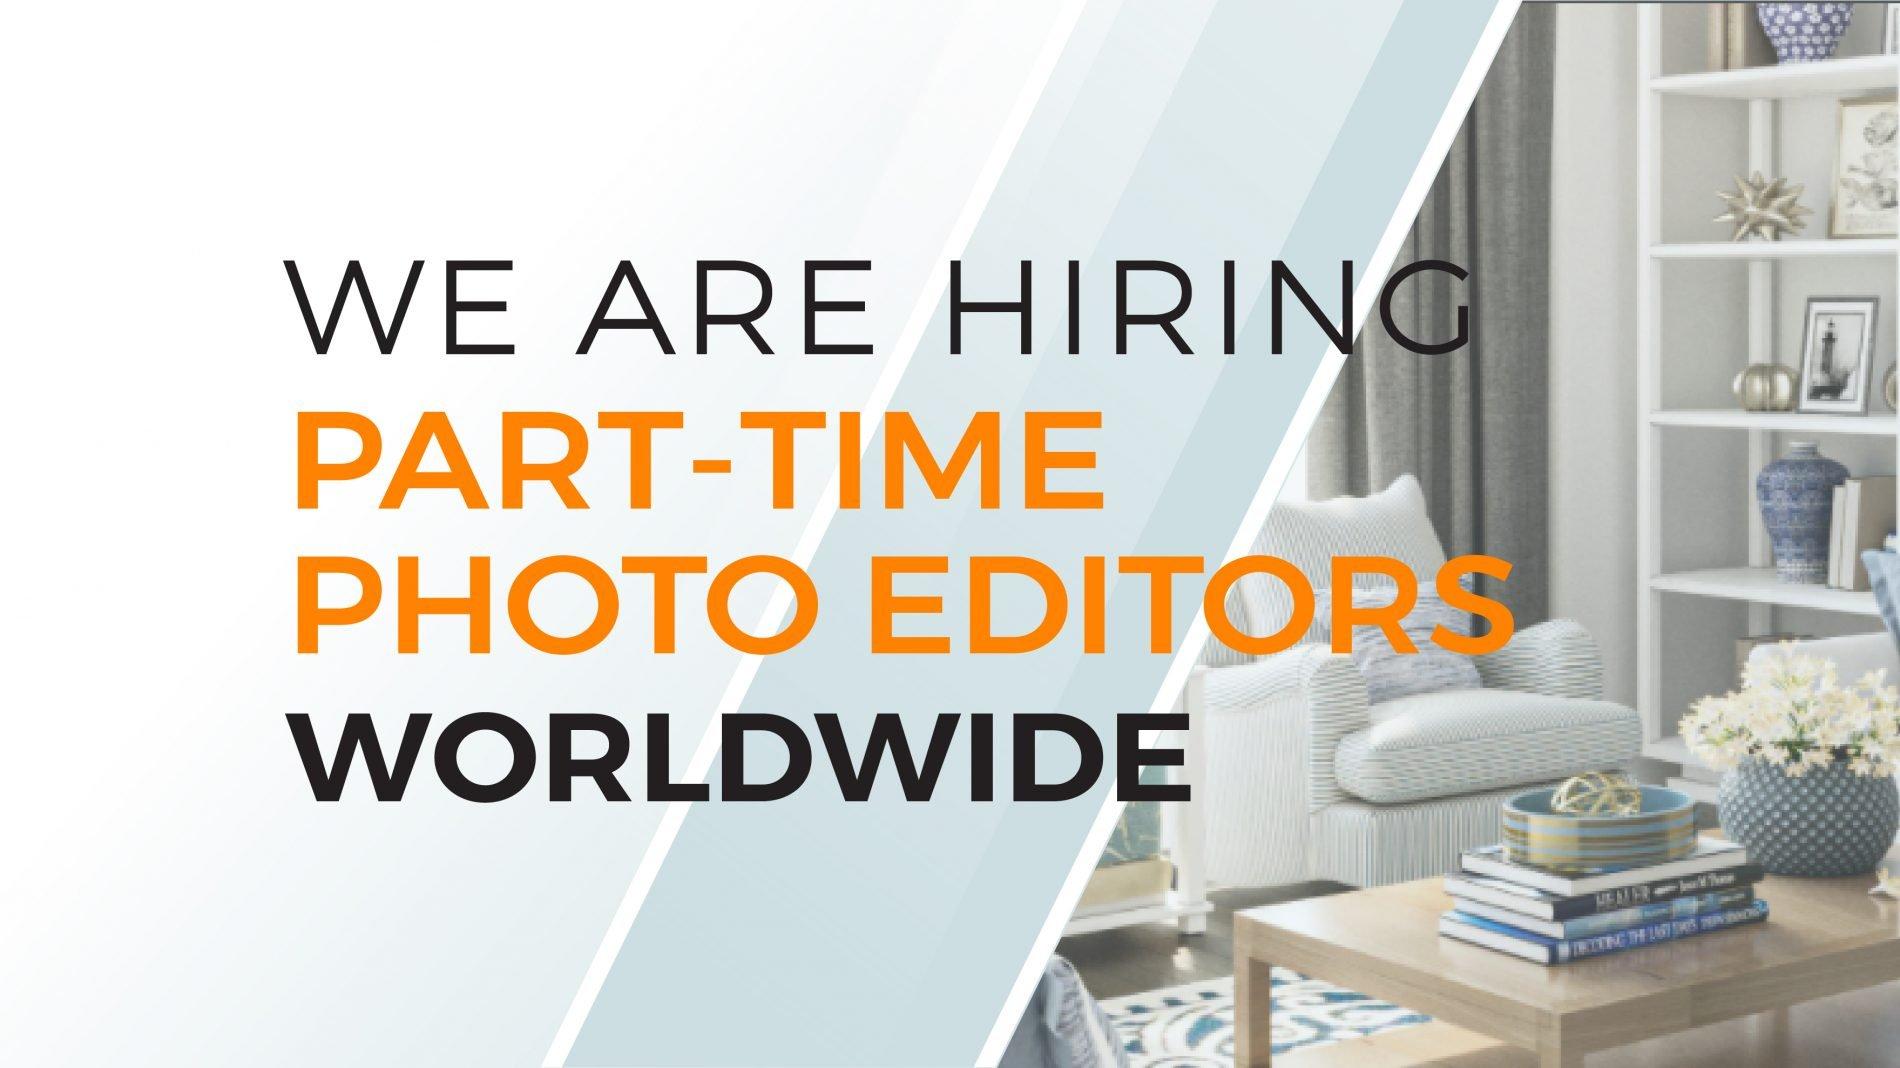 Photo Editor Recruitment